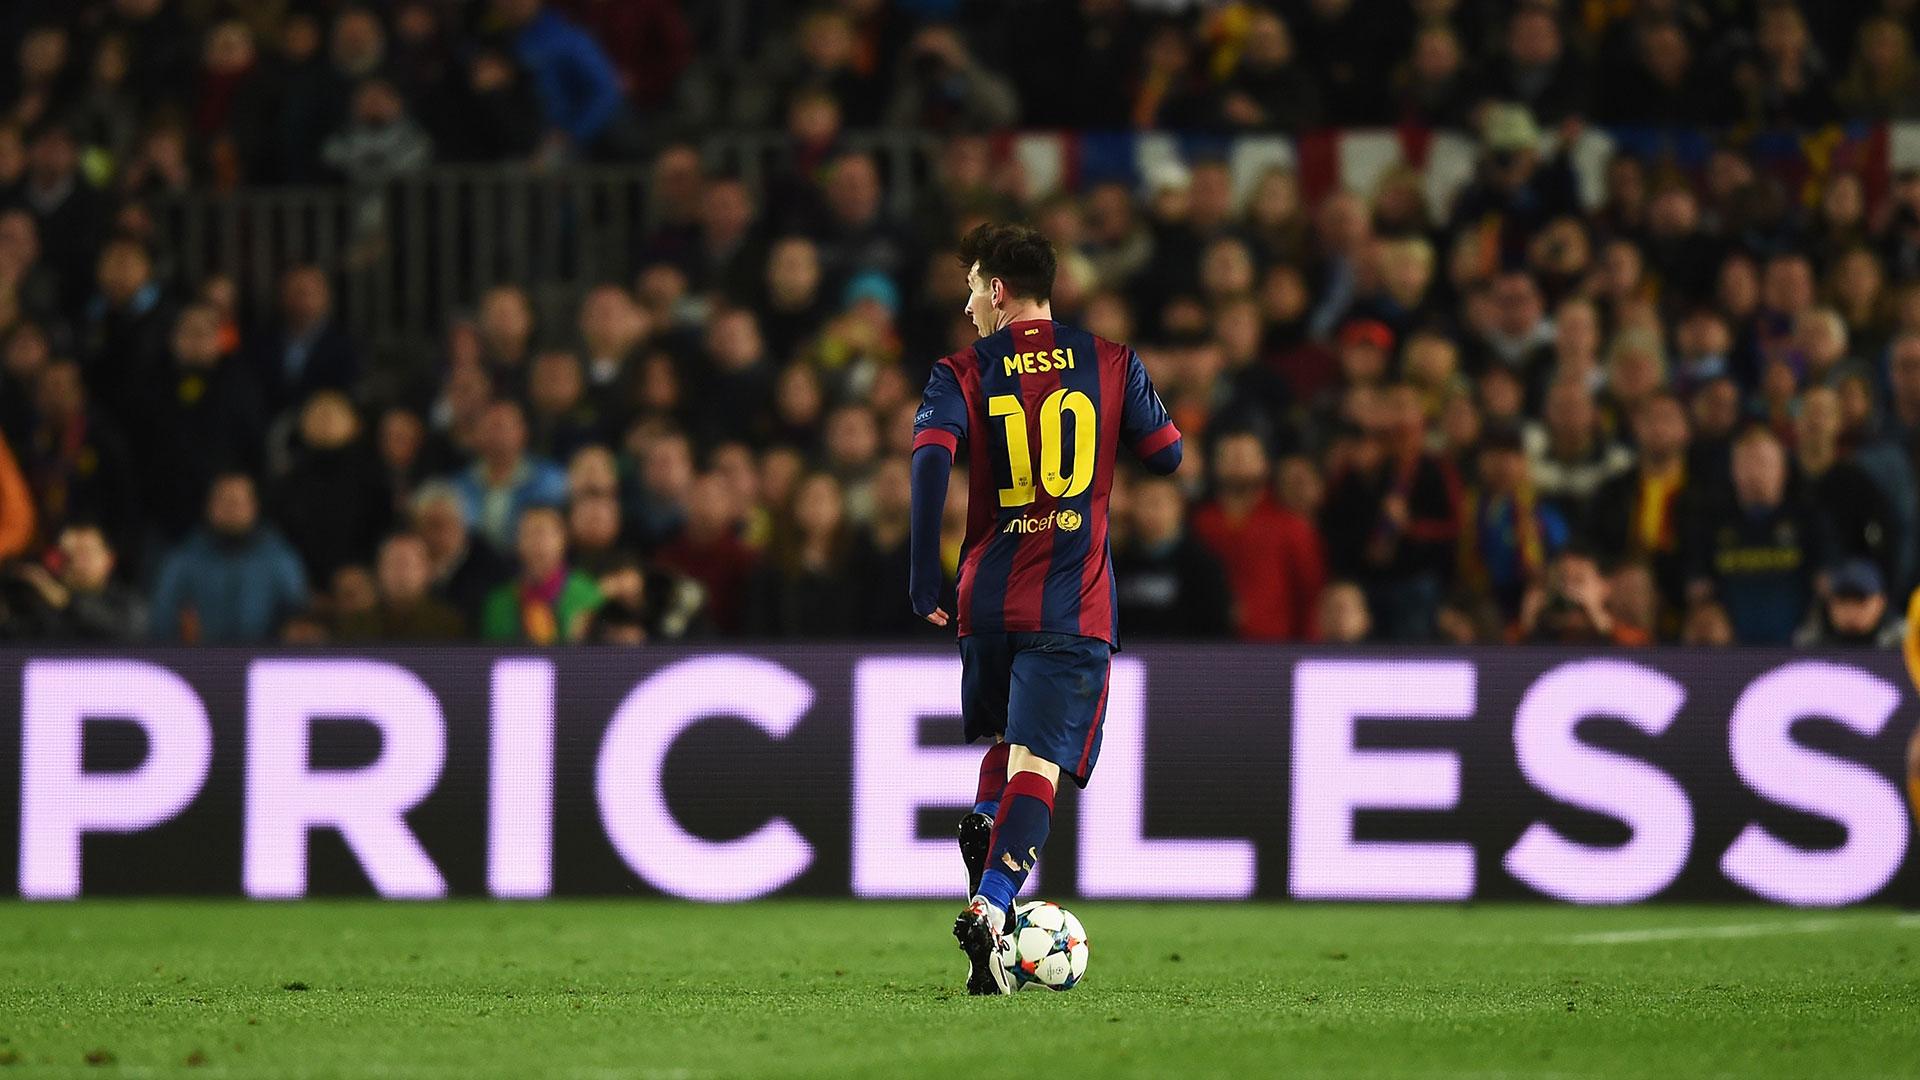 Lionel Messi Barcelona Priceless